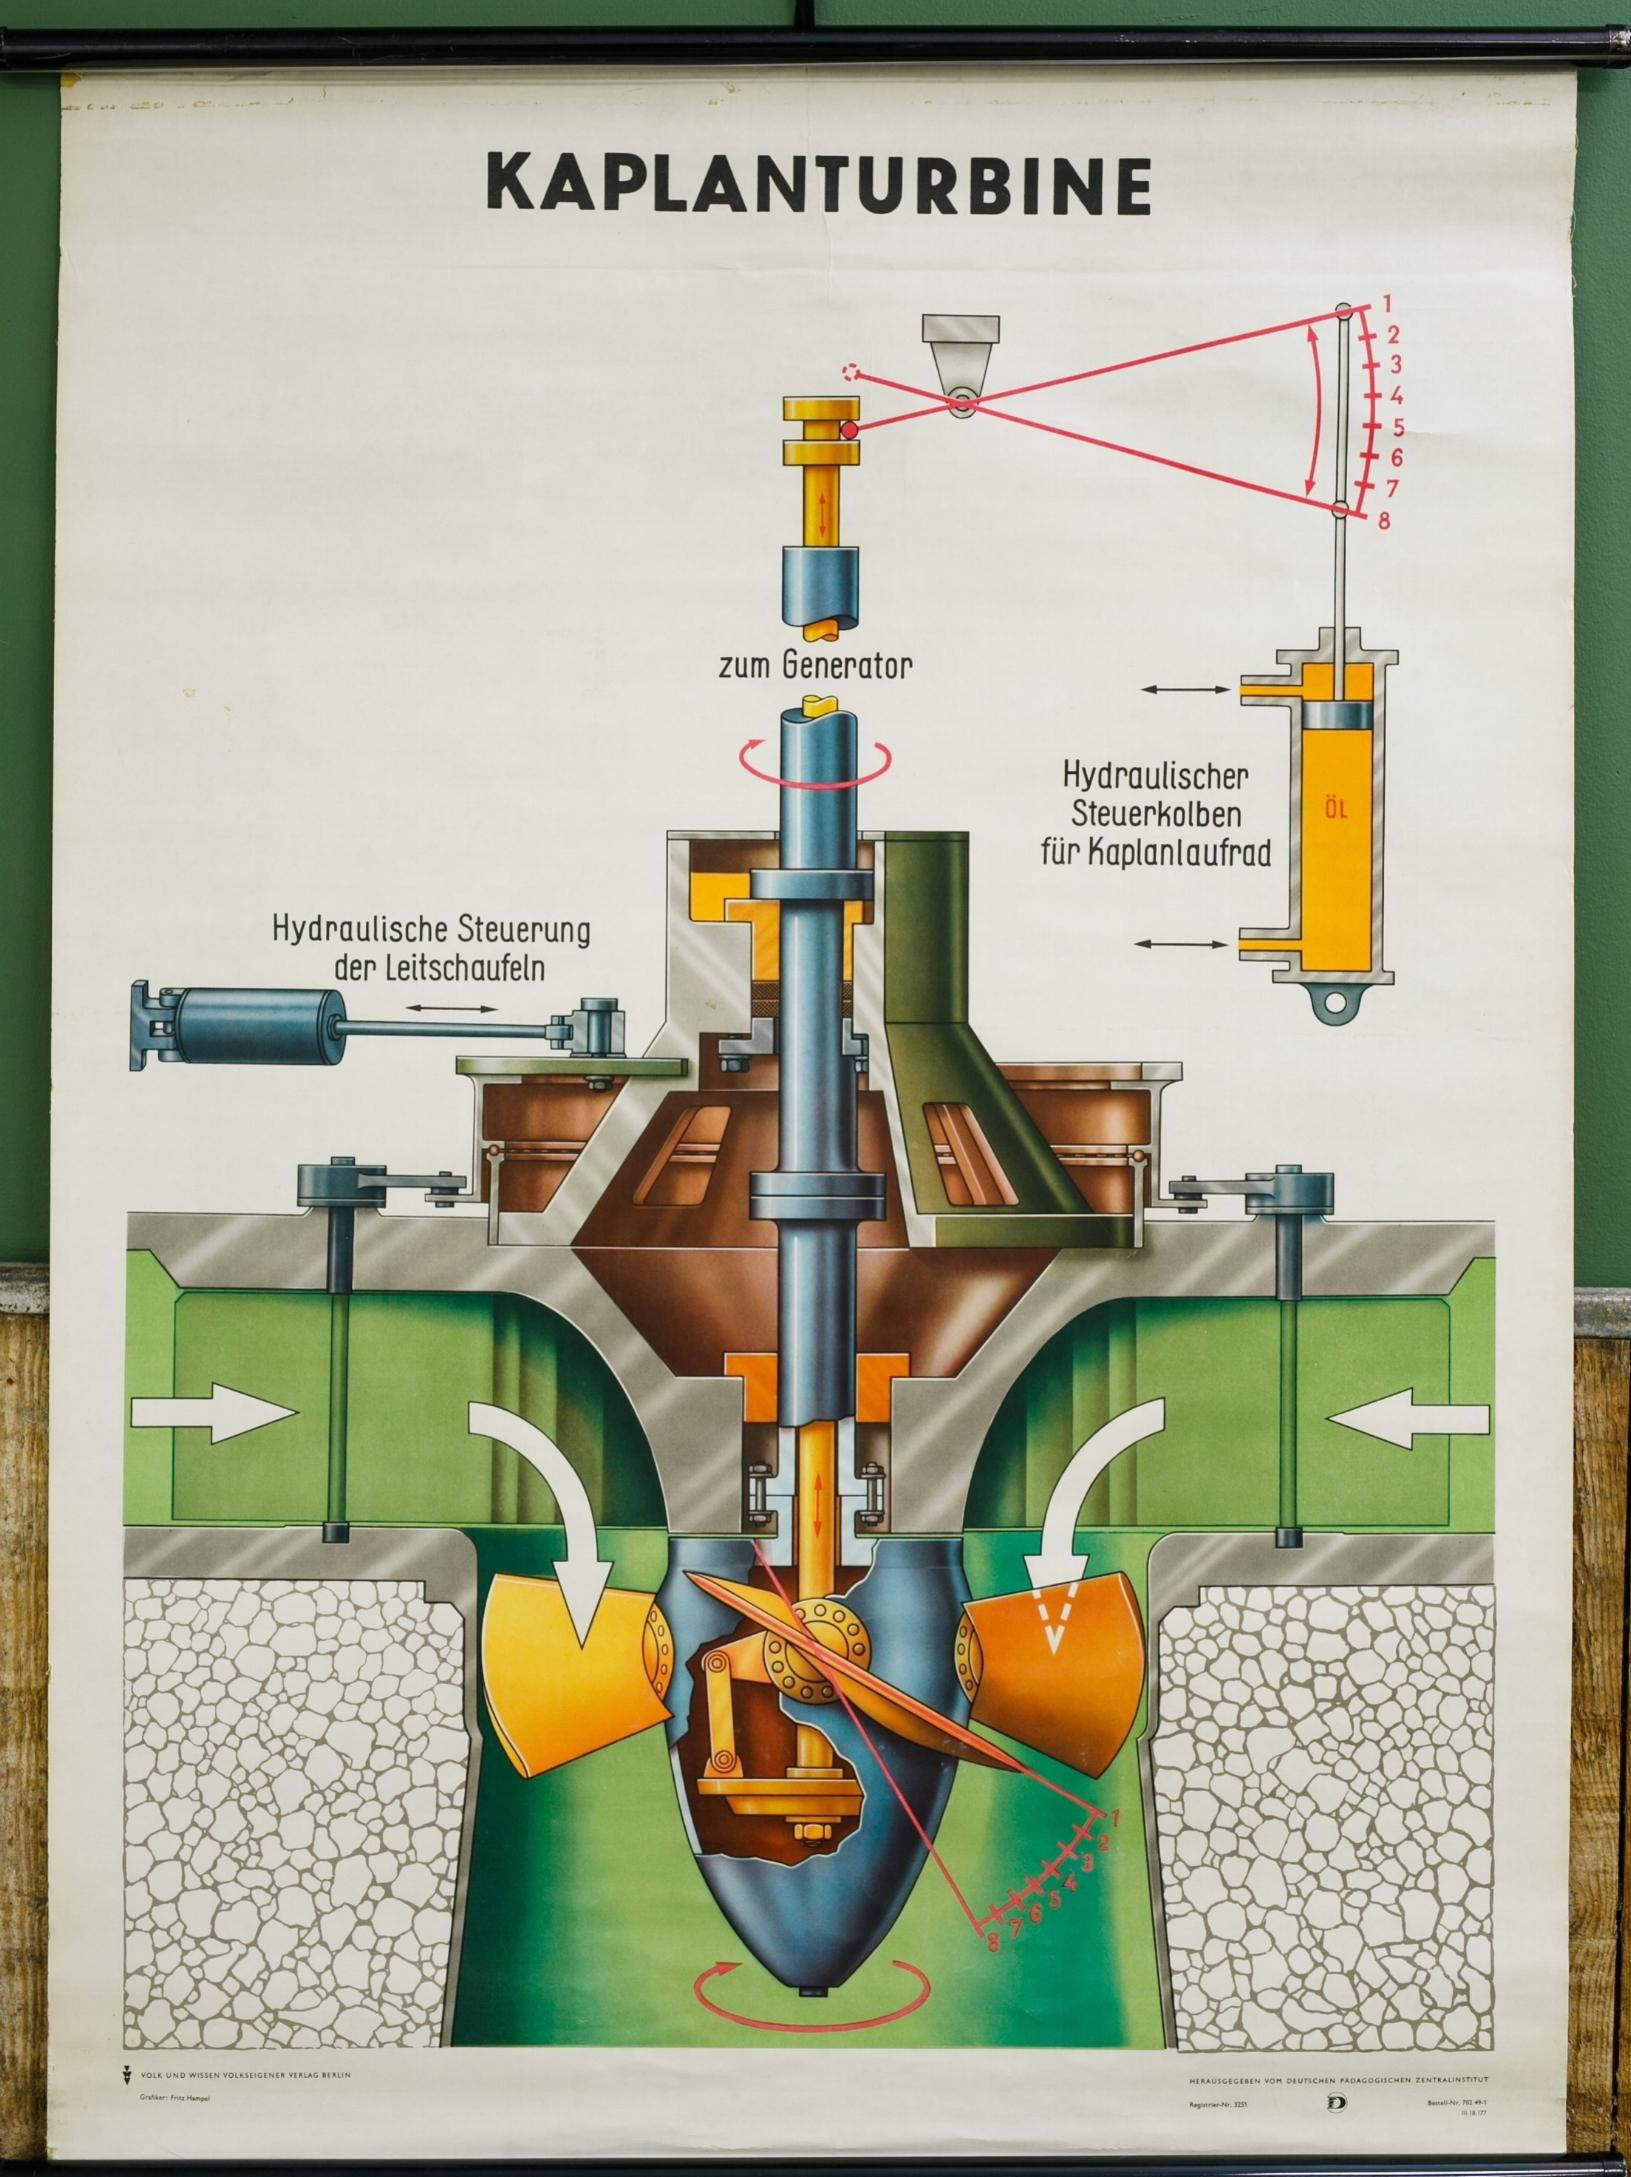 Vintage German Teaching Chart of a Kaplan Turbine